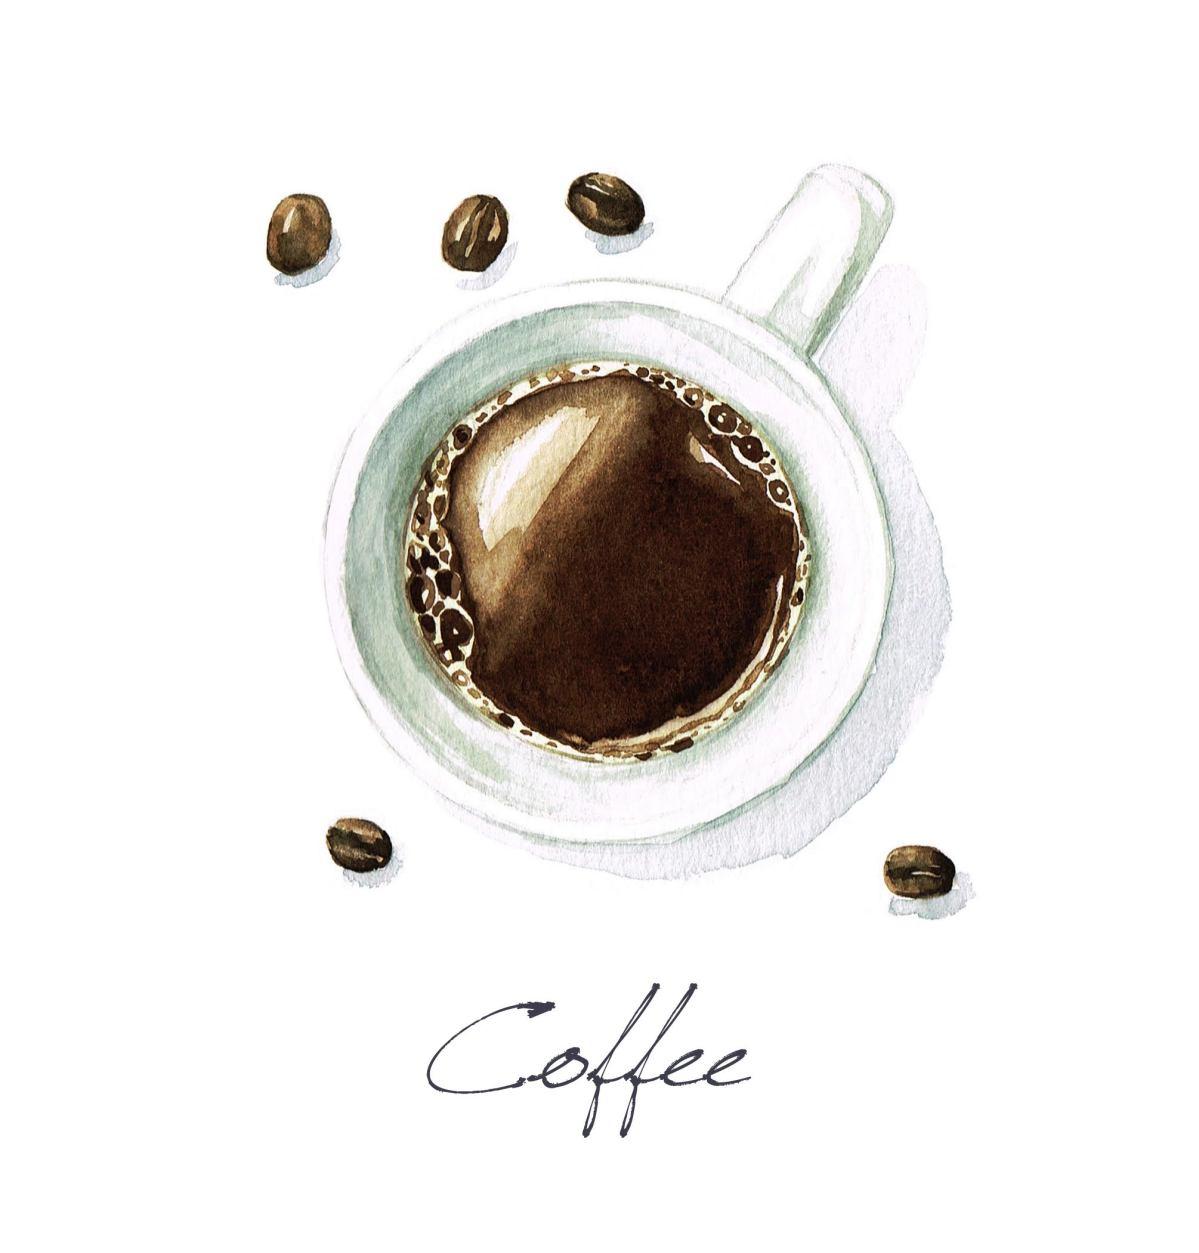 CAFFè.jpg?fit=1200%2C1253